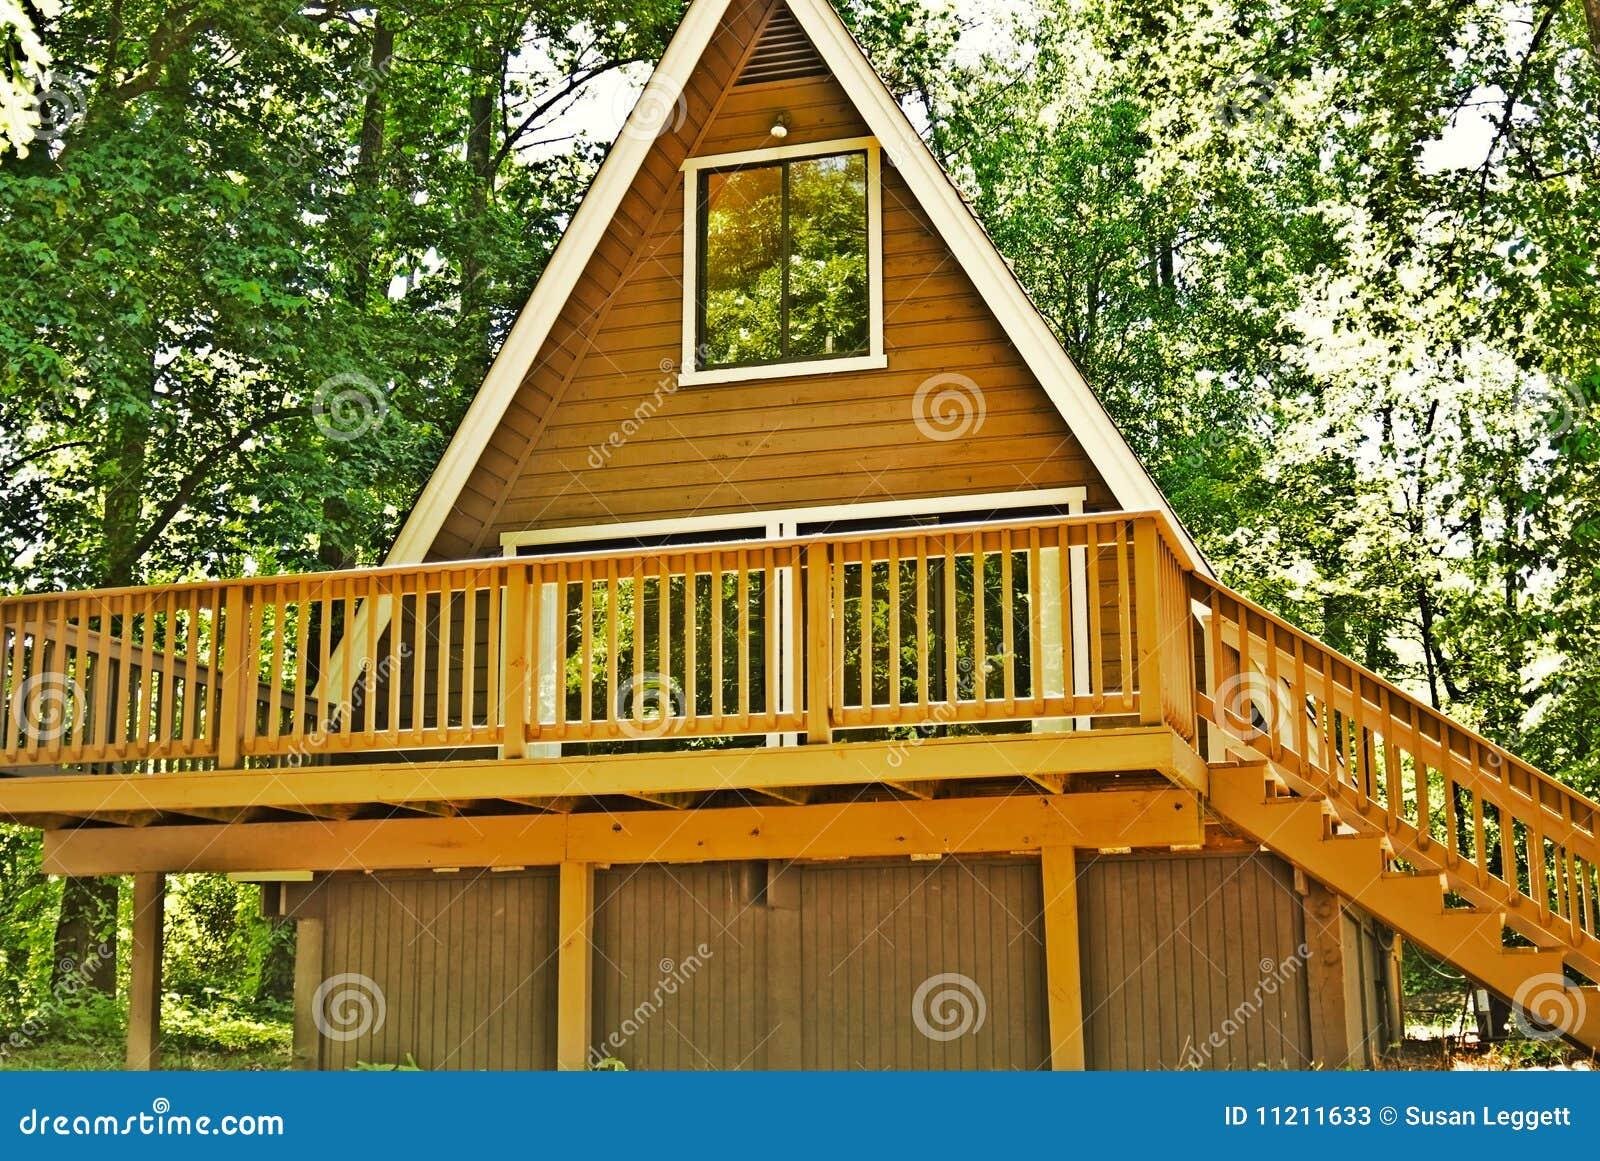 Wooden A Frame House Deck Stock Photos Image 11211633